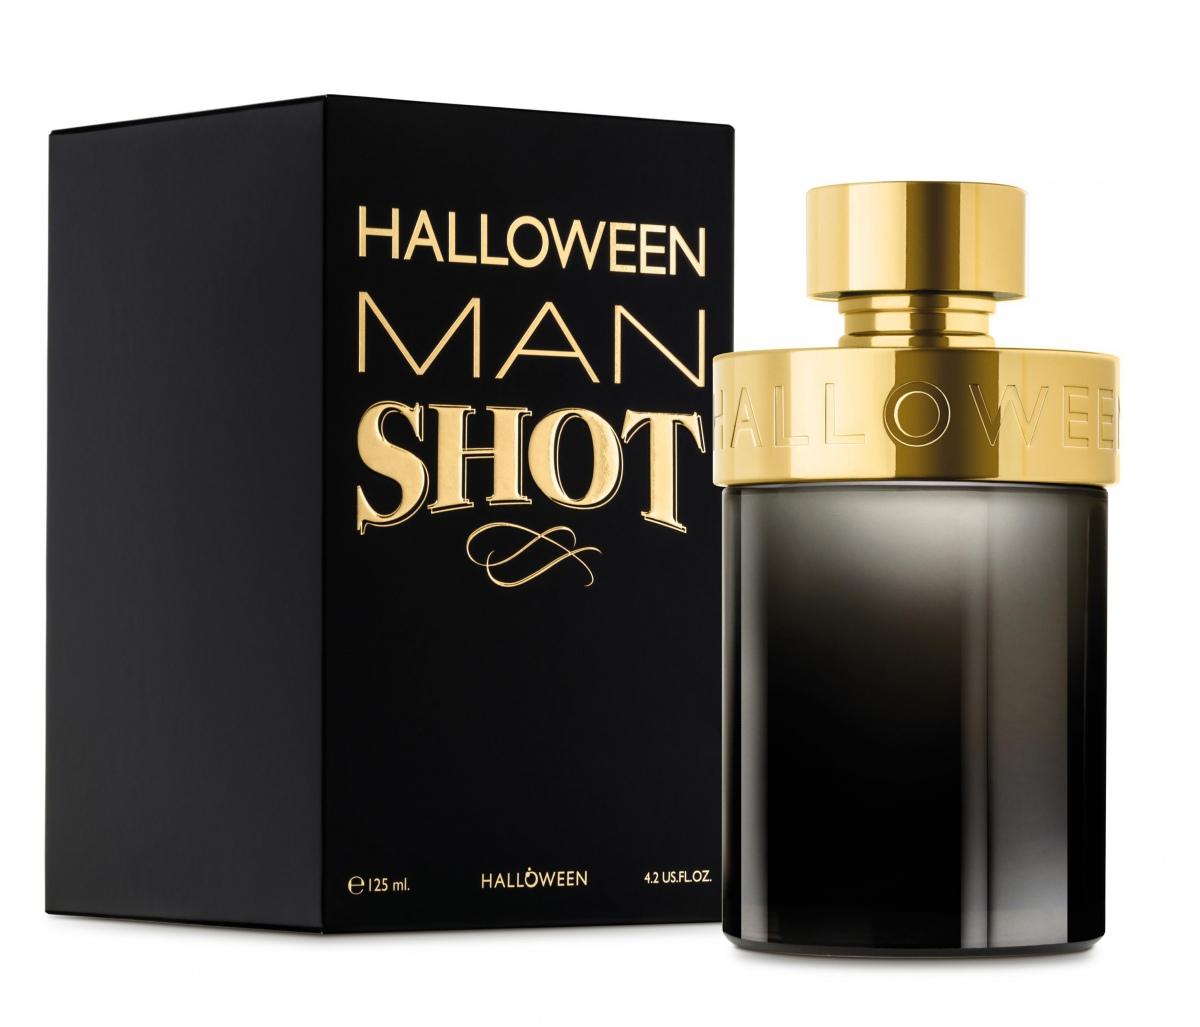 Resultado de imagem para Halloween Man Shot de Halloween